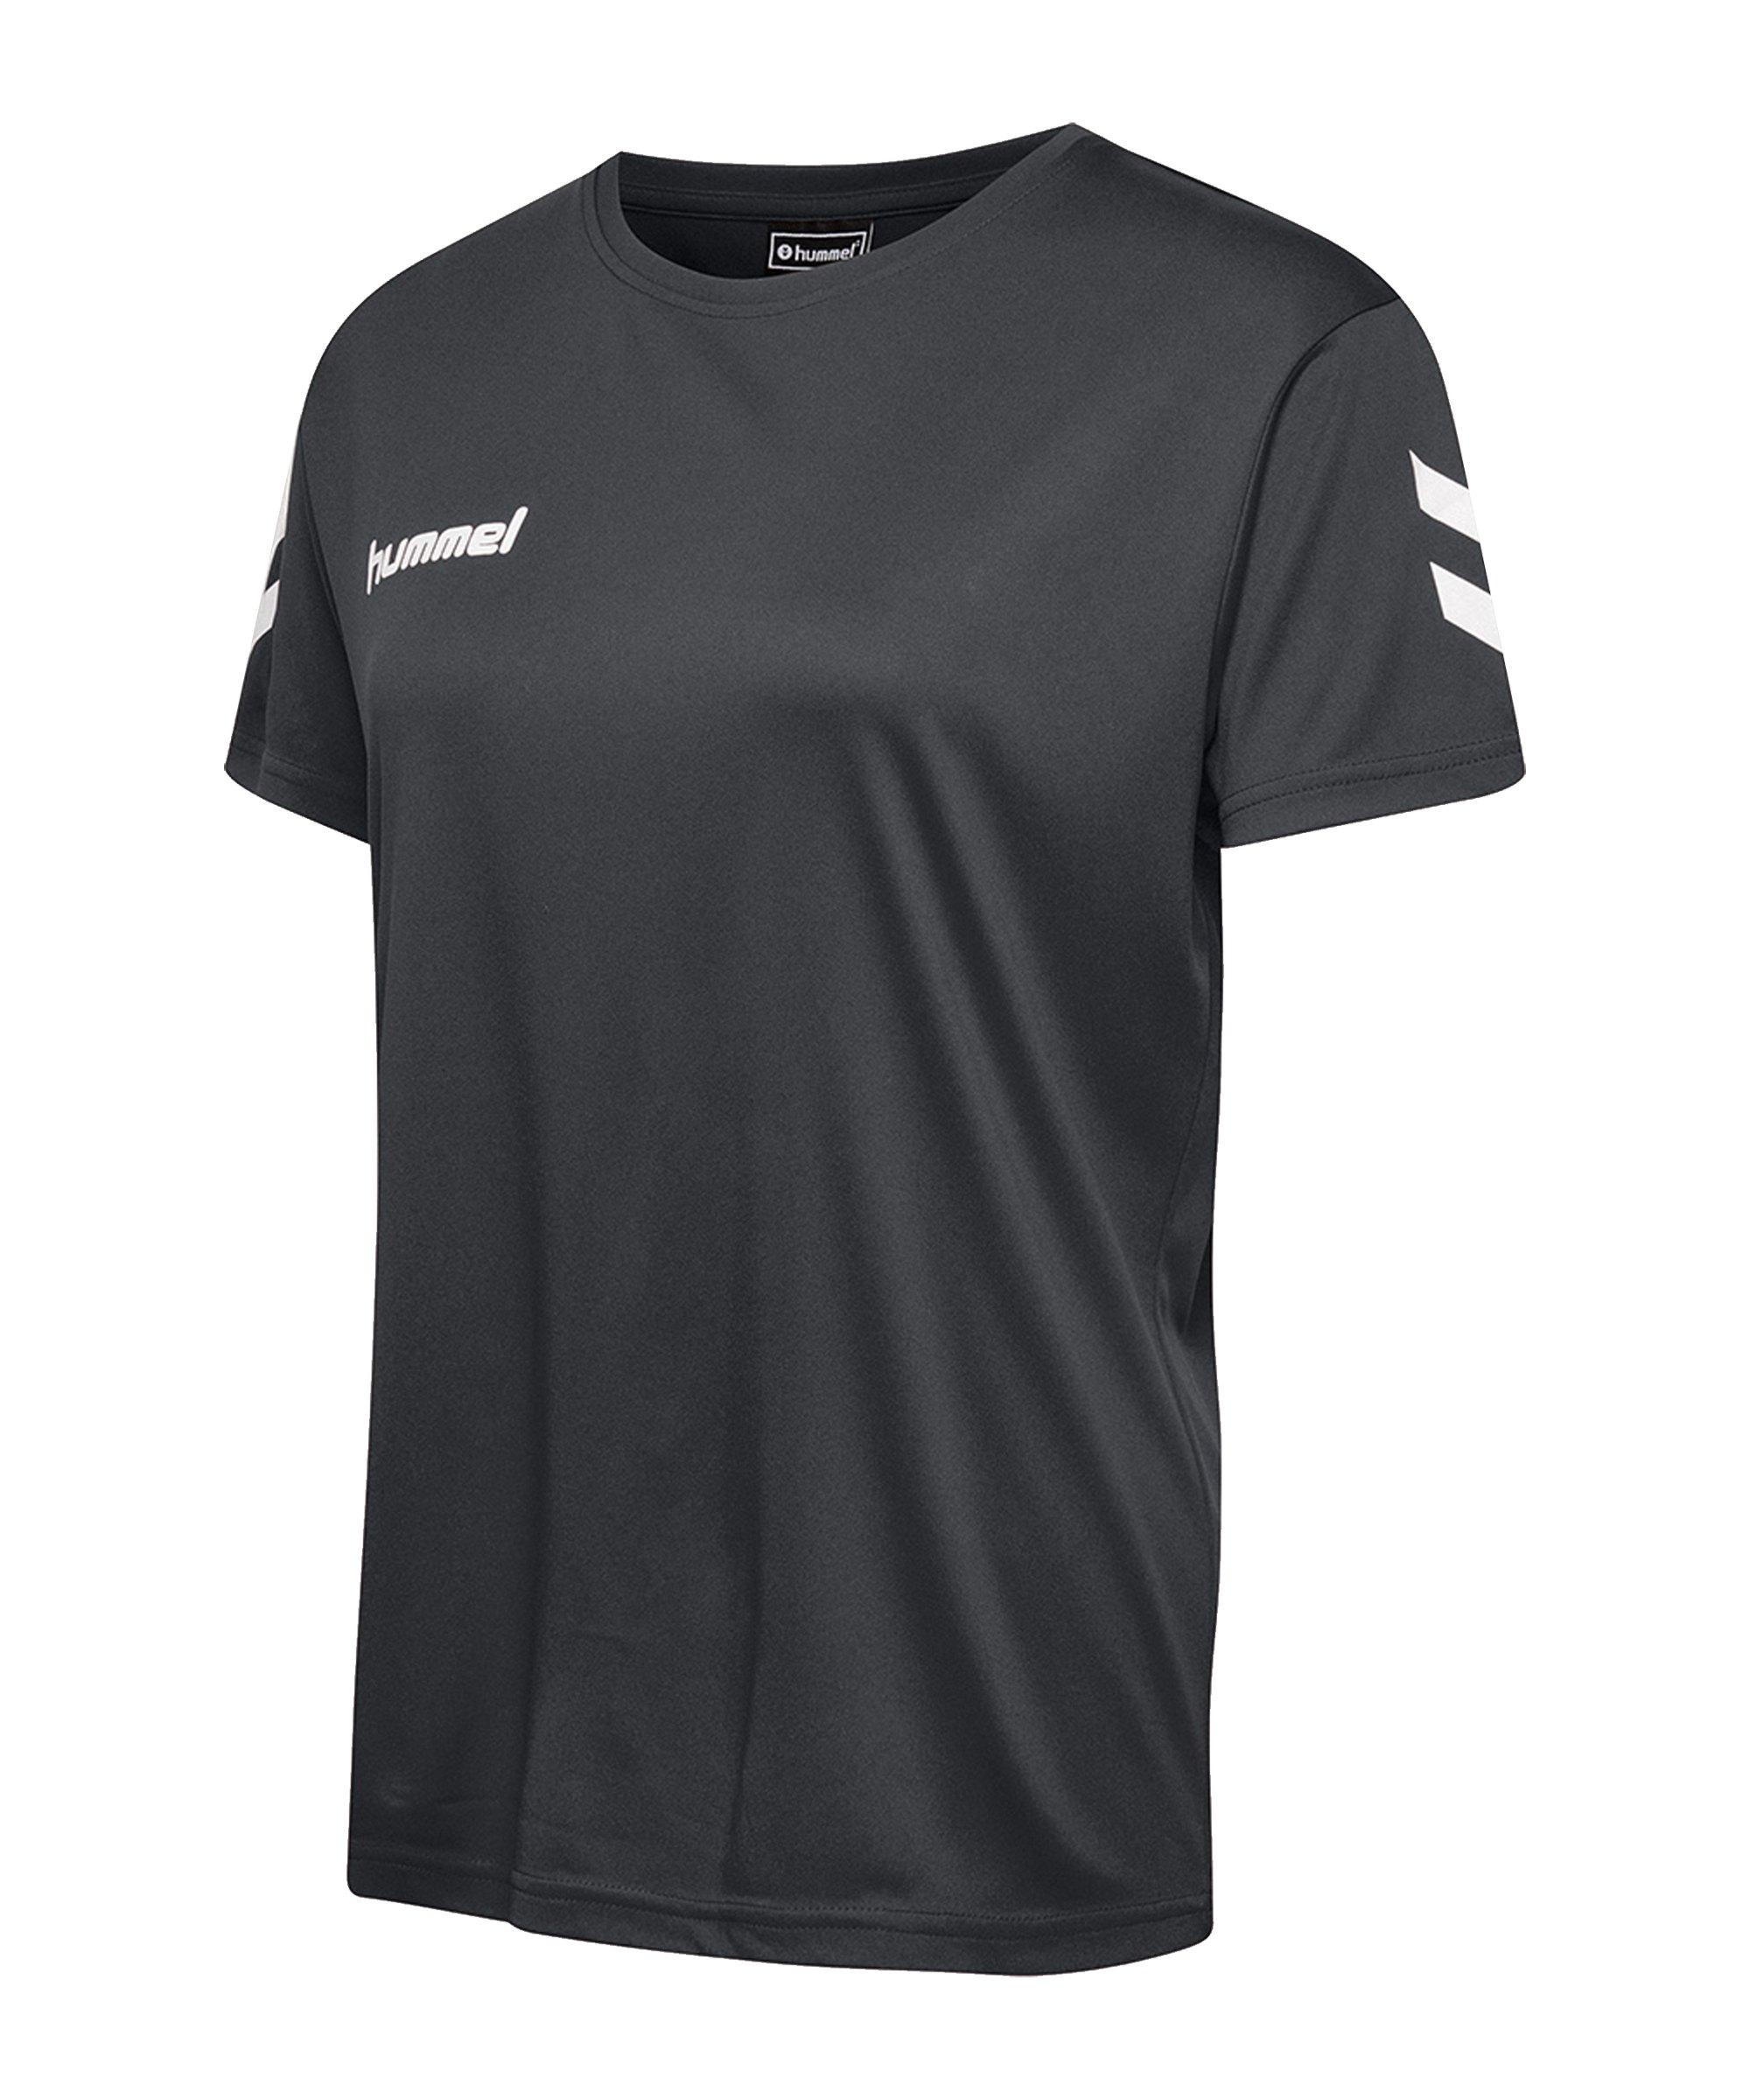 Hummel Core Poly Tee T-Shirt Damen F1525 - schwarz